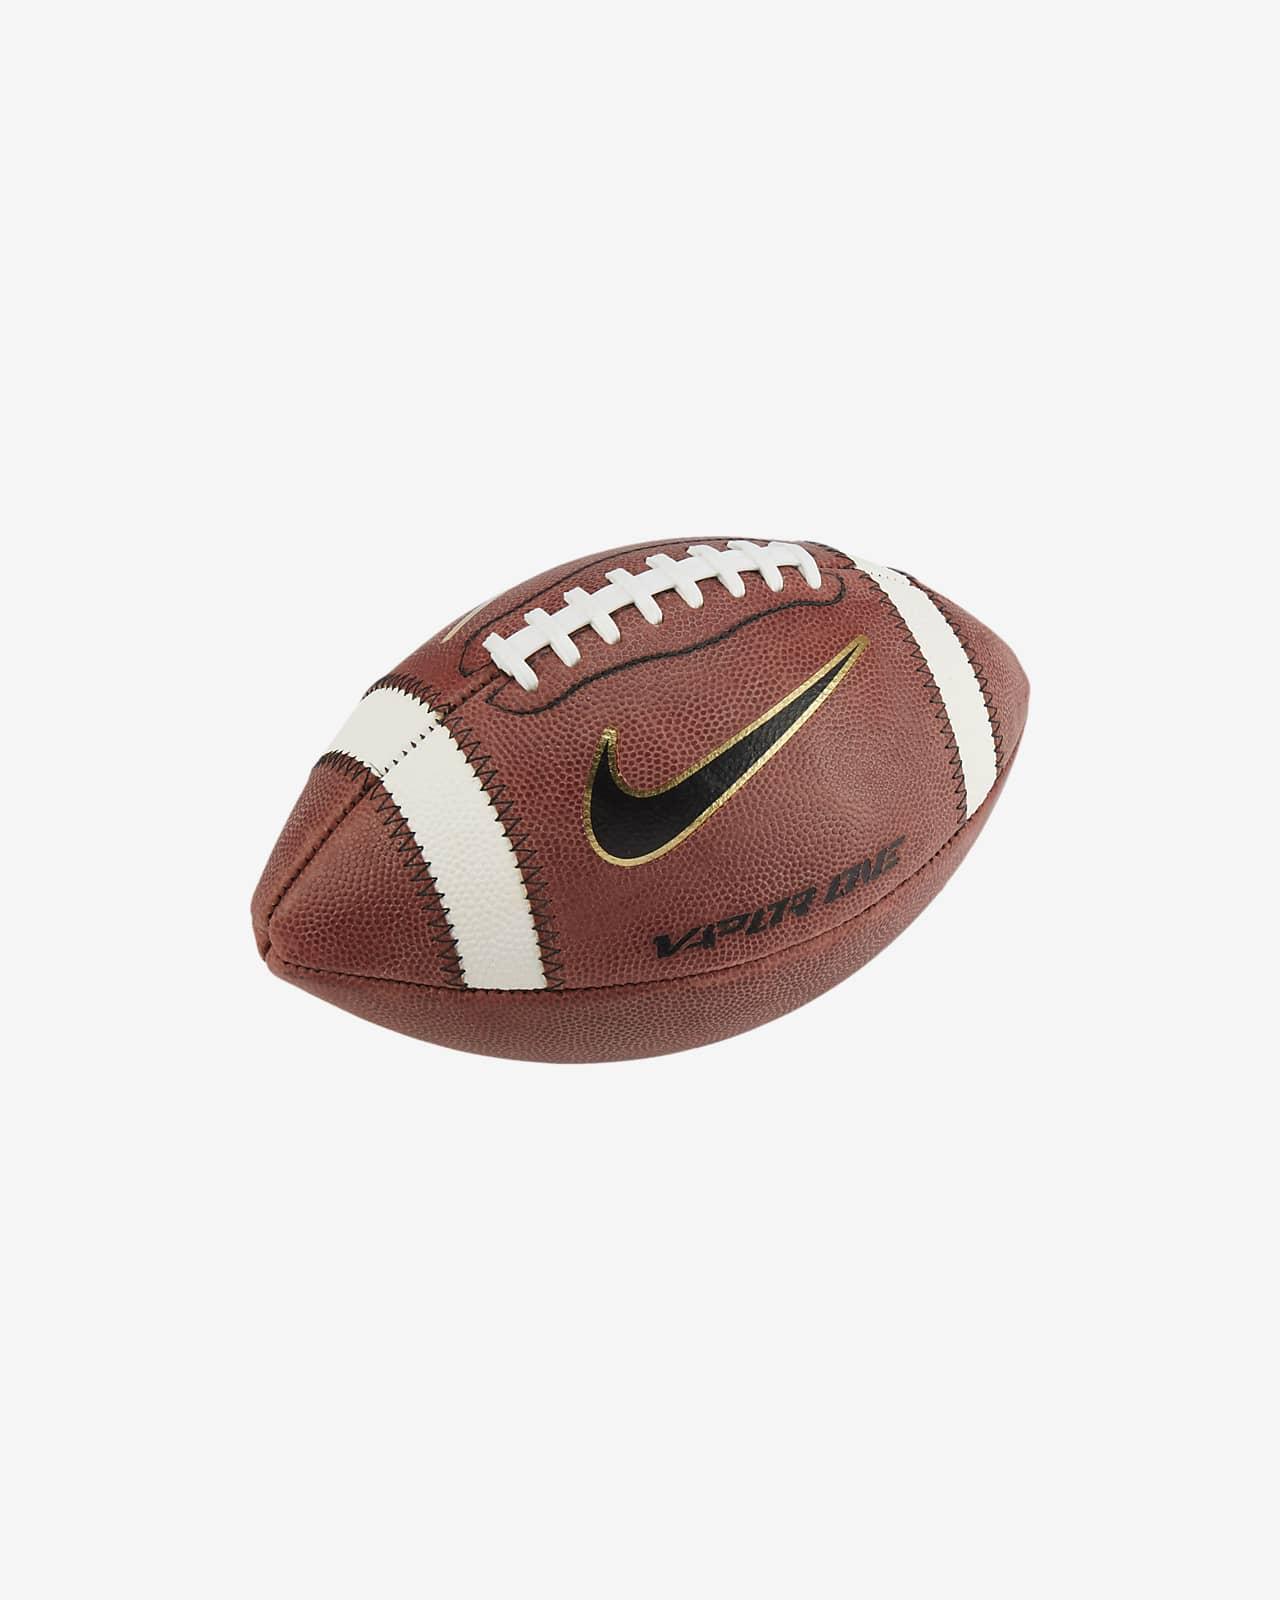 Nike Vapor One Official Football